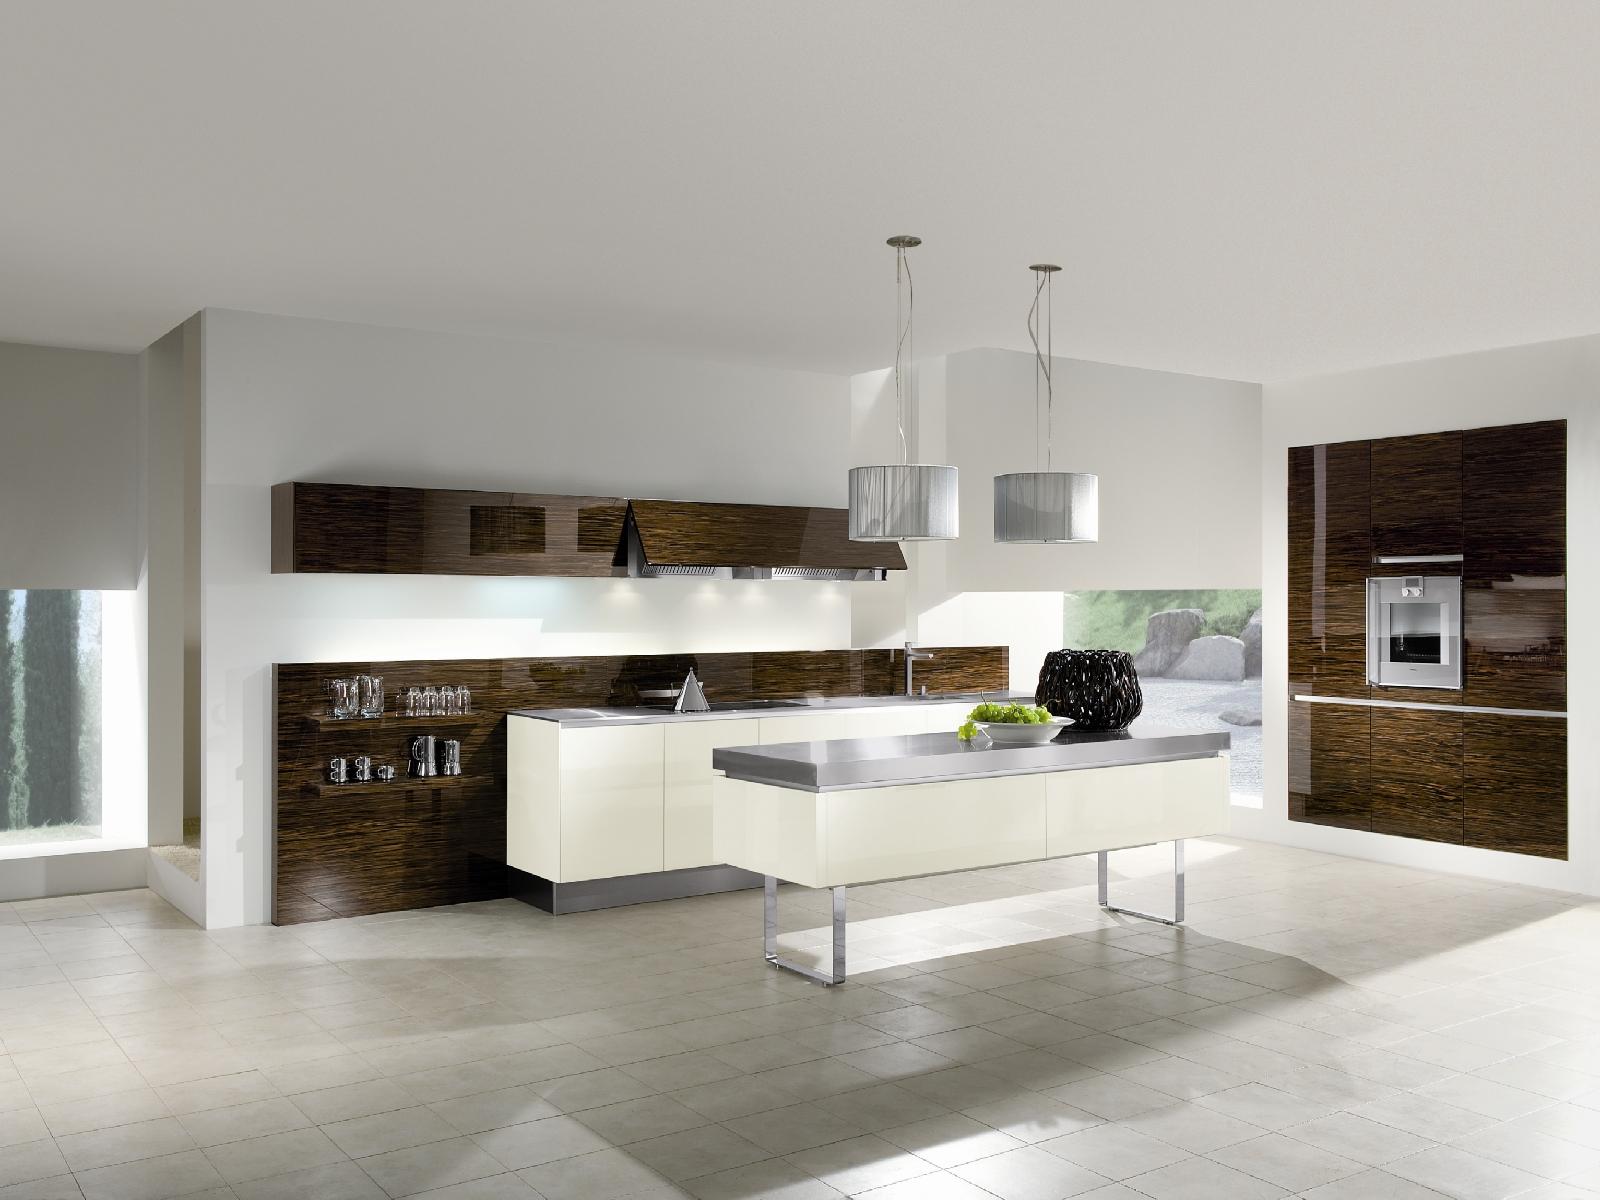 moderne keukens vindt u in friesland bij huizenga keukenstyle. Black Bedroom Furniture Sets. Home Design Ideas